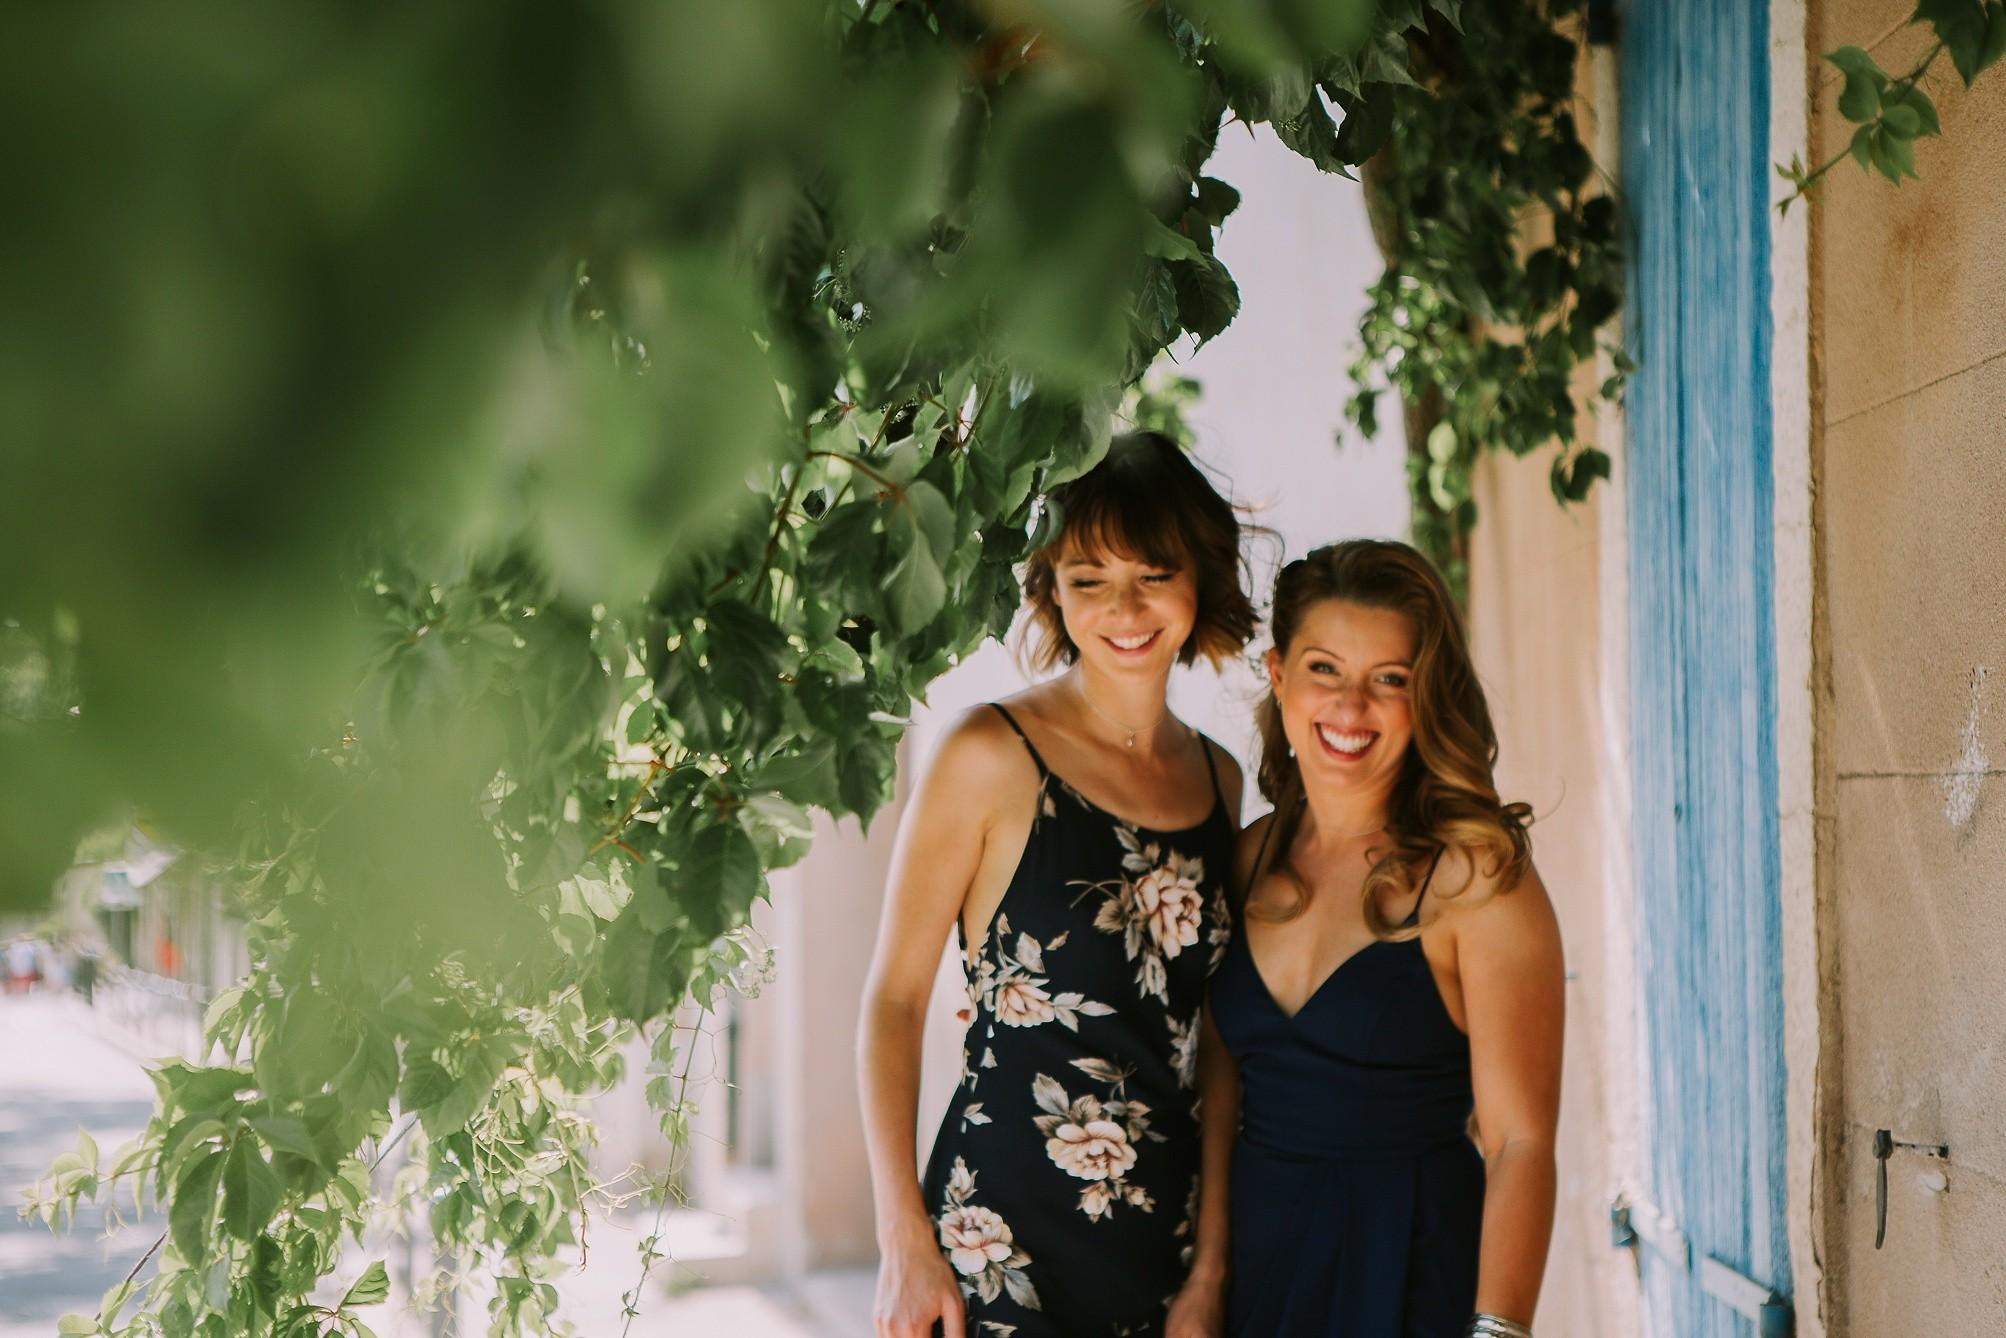 katerynaphotos-mariage-photographe-puyloubier-provence-aix-en-provence-sud-de-la-france_0384.jpg